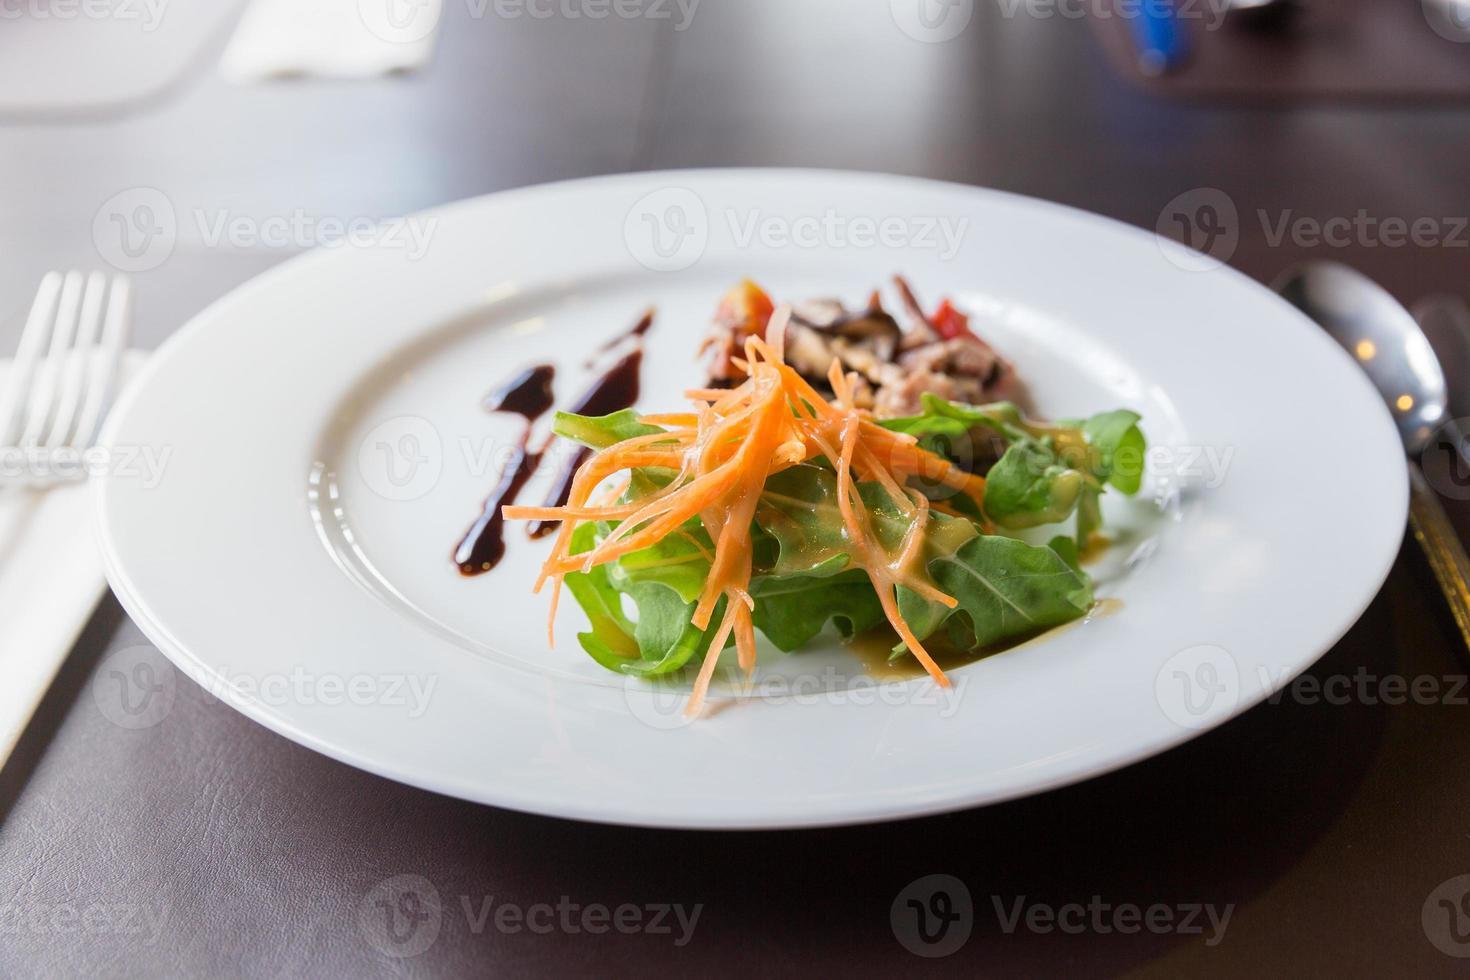 Apitizer mushroom salad mixed with pork photo